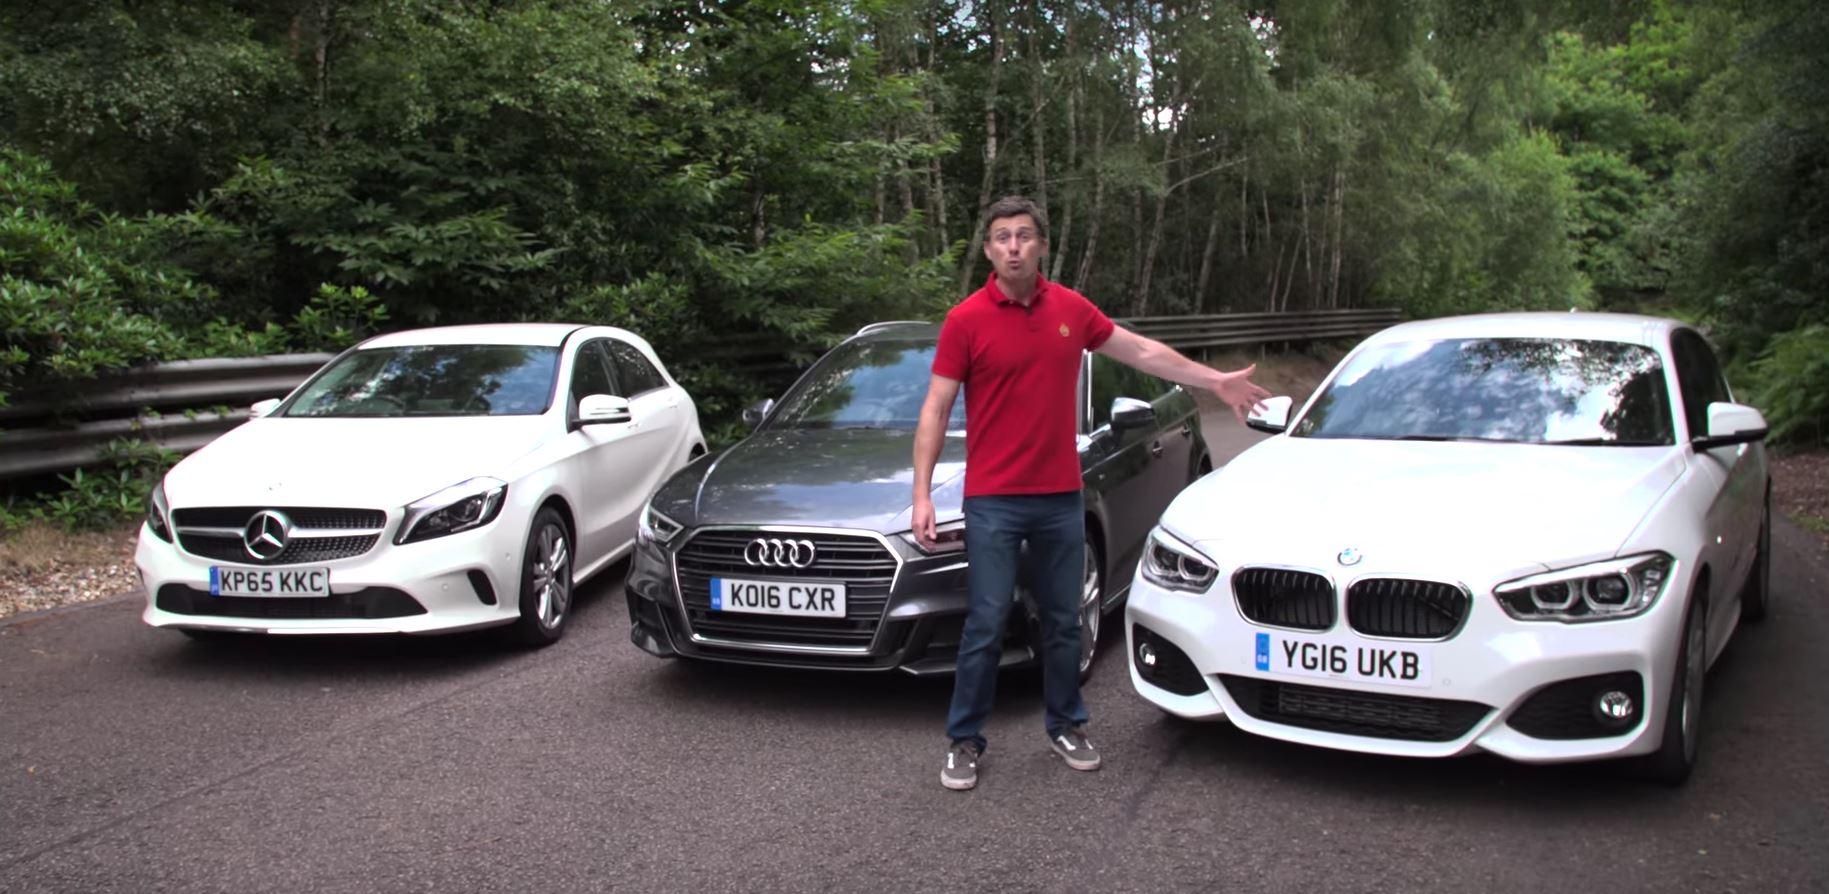 7 Photos 2017 Audi A3 Crowned The Best Premium German Hatchback